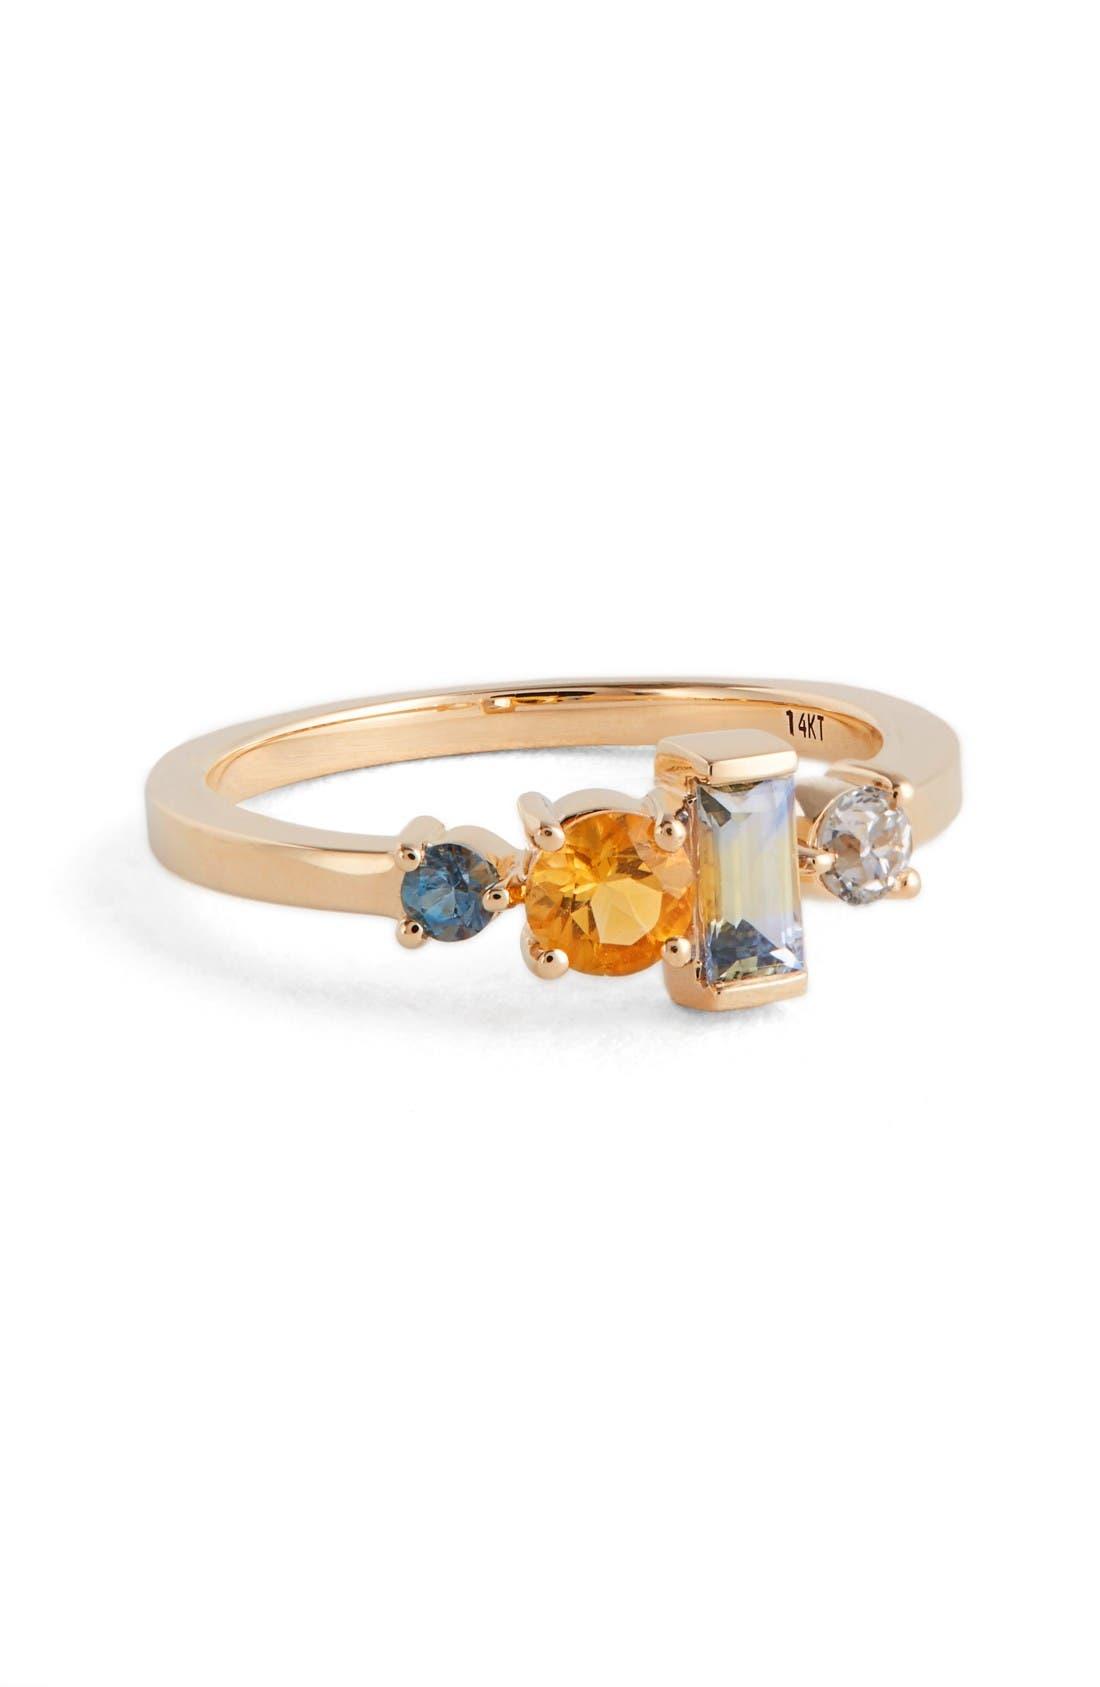 MOCIUN Sapphire, Citrine, Diamond & Aquamarine Ring